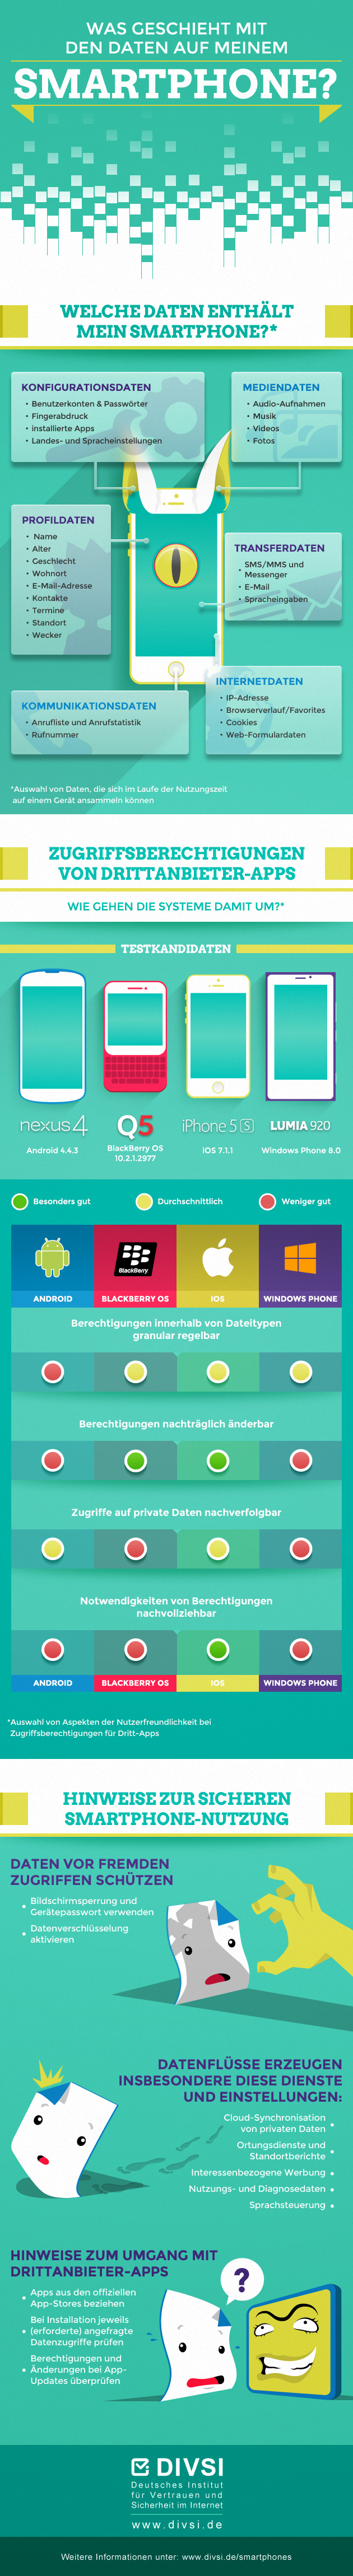 DIVSI Infografik: Wissenswertes im Umgang mit Smartphones